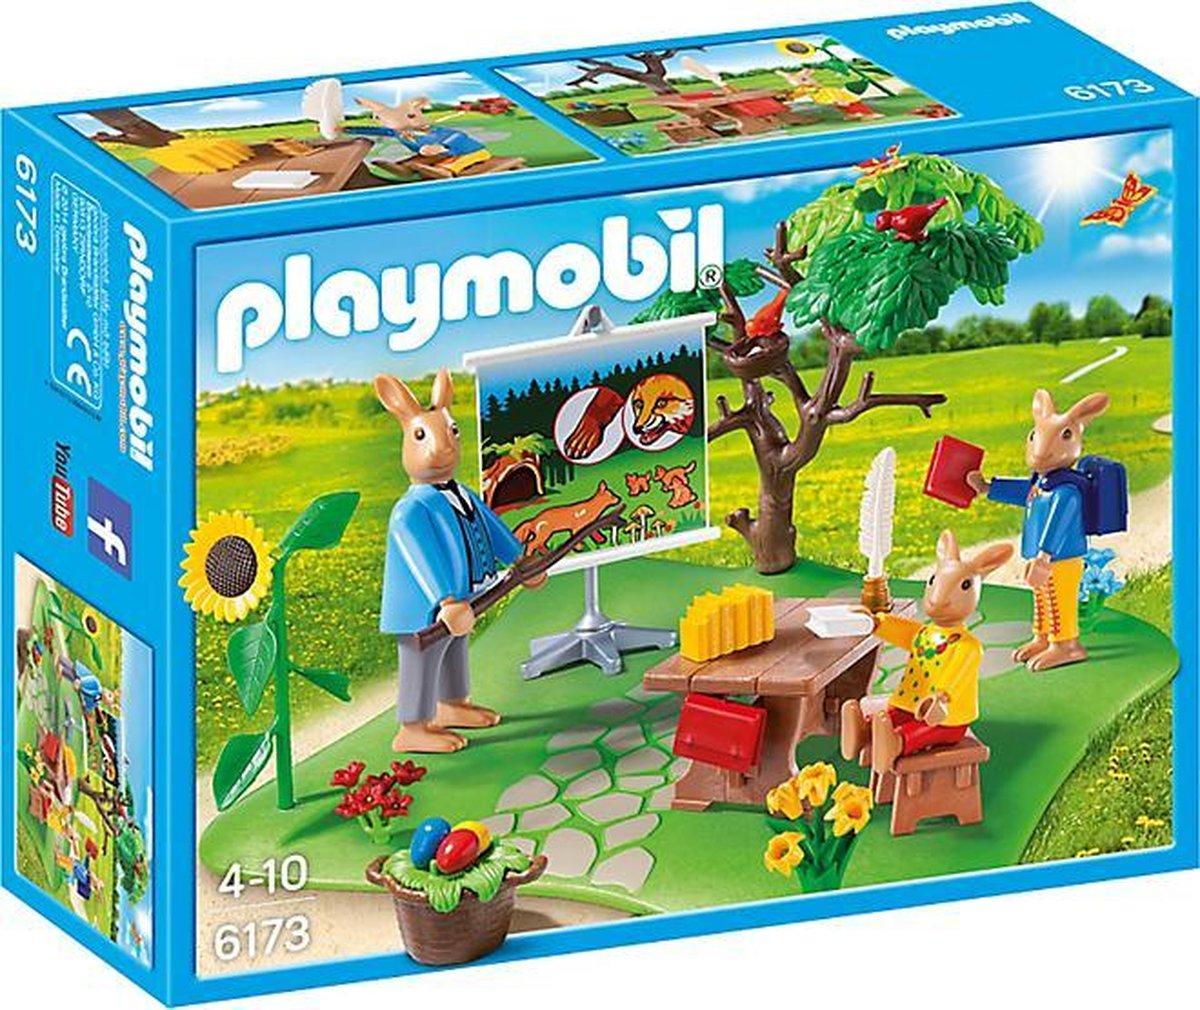 Playmobil Paashazenschool